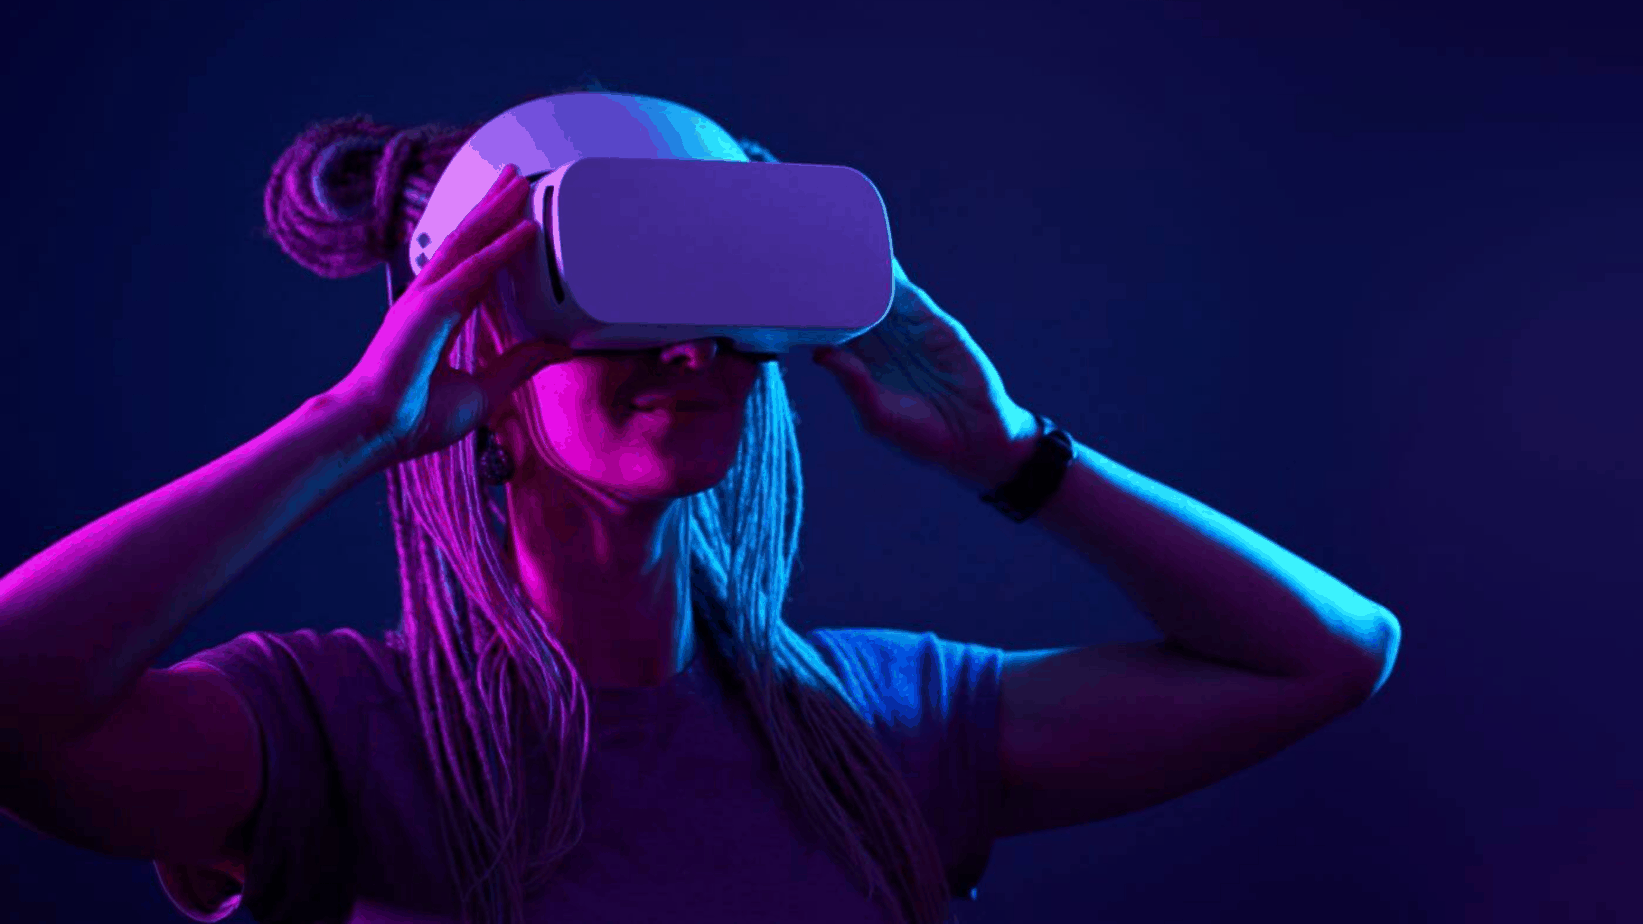 VR Apps